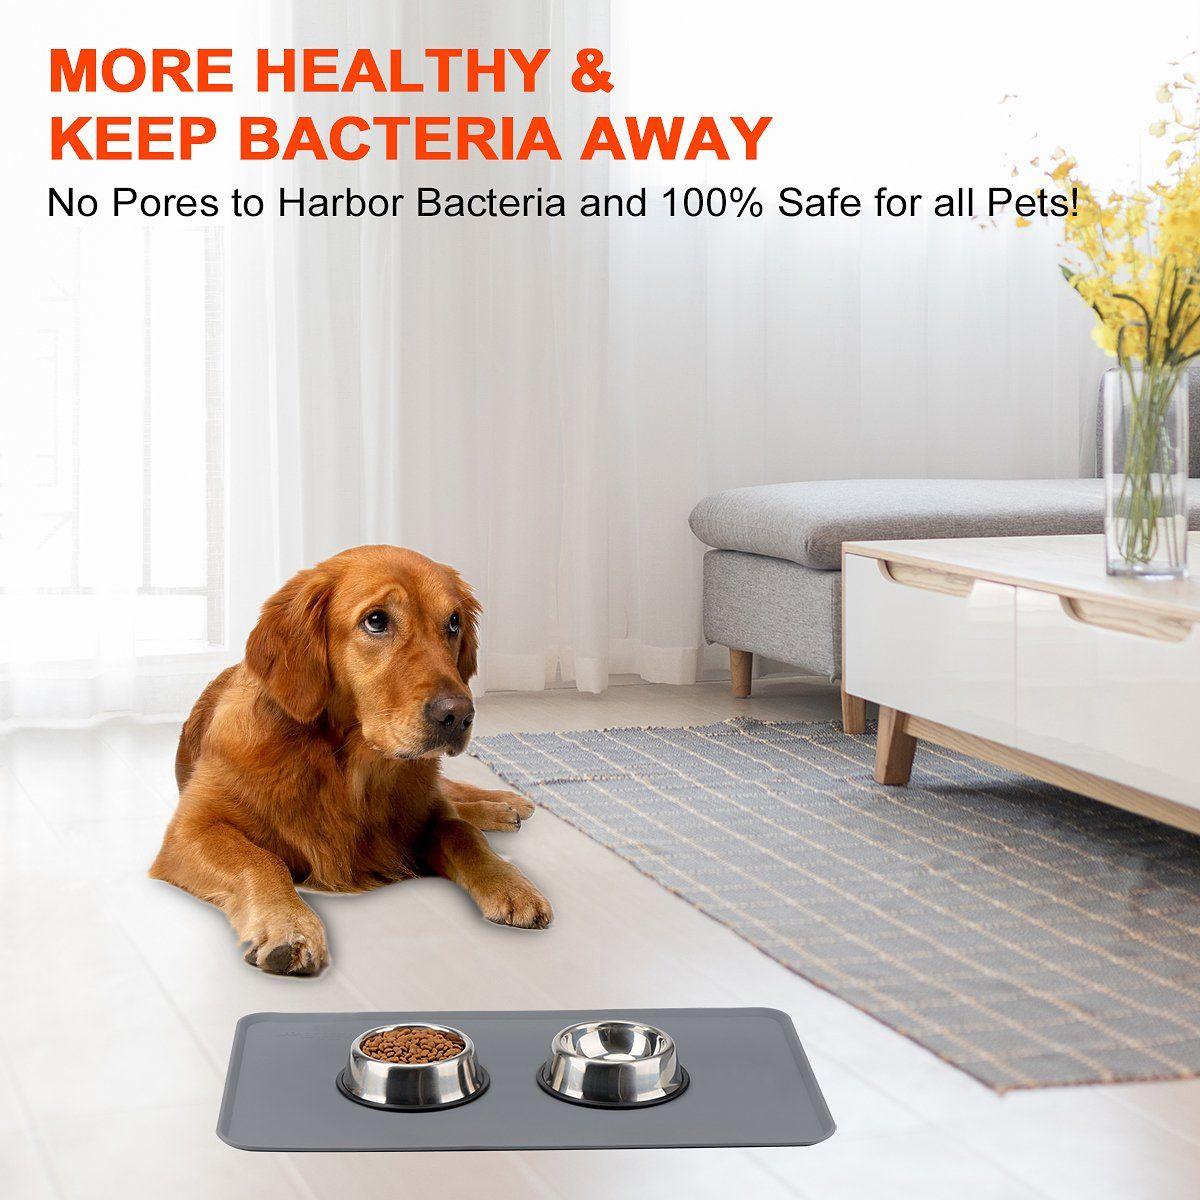 Hicobos dog feeding mat for food bowl fda silicone extra